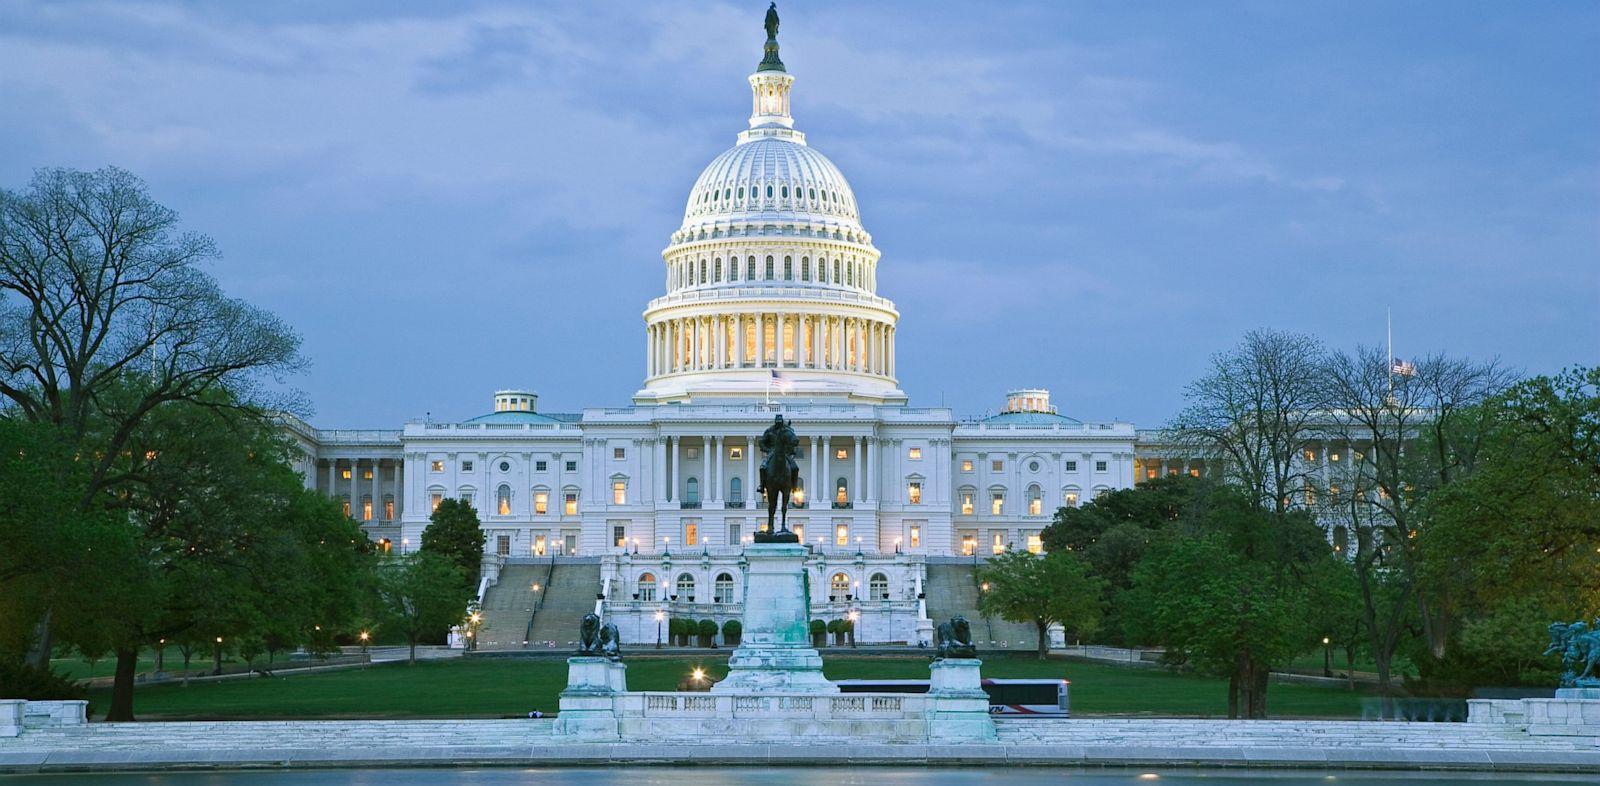 United States Congress - Wikipedia